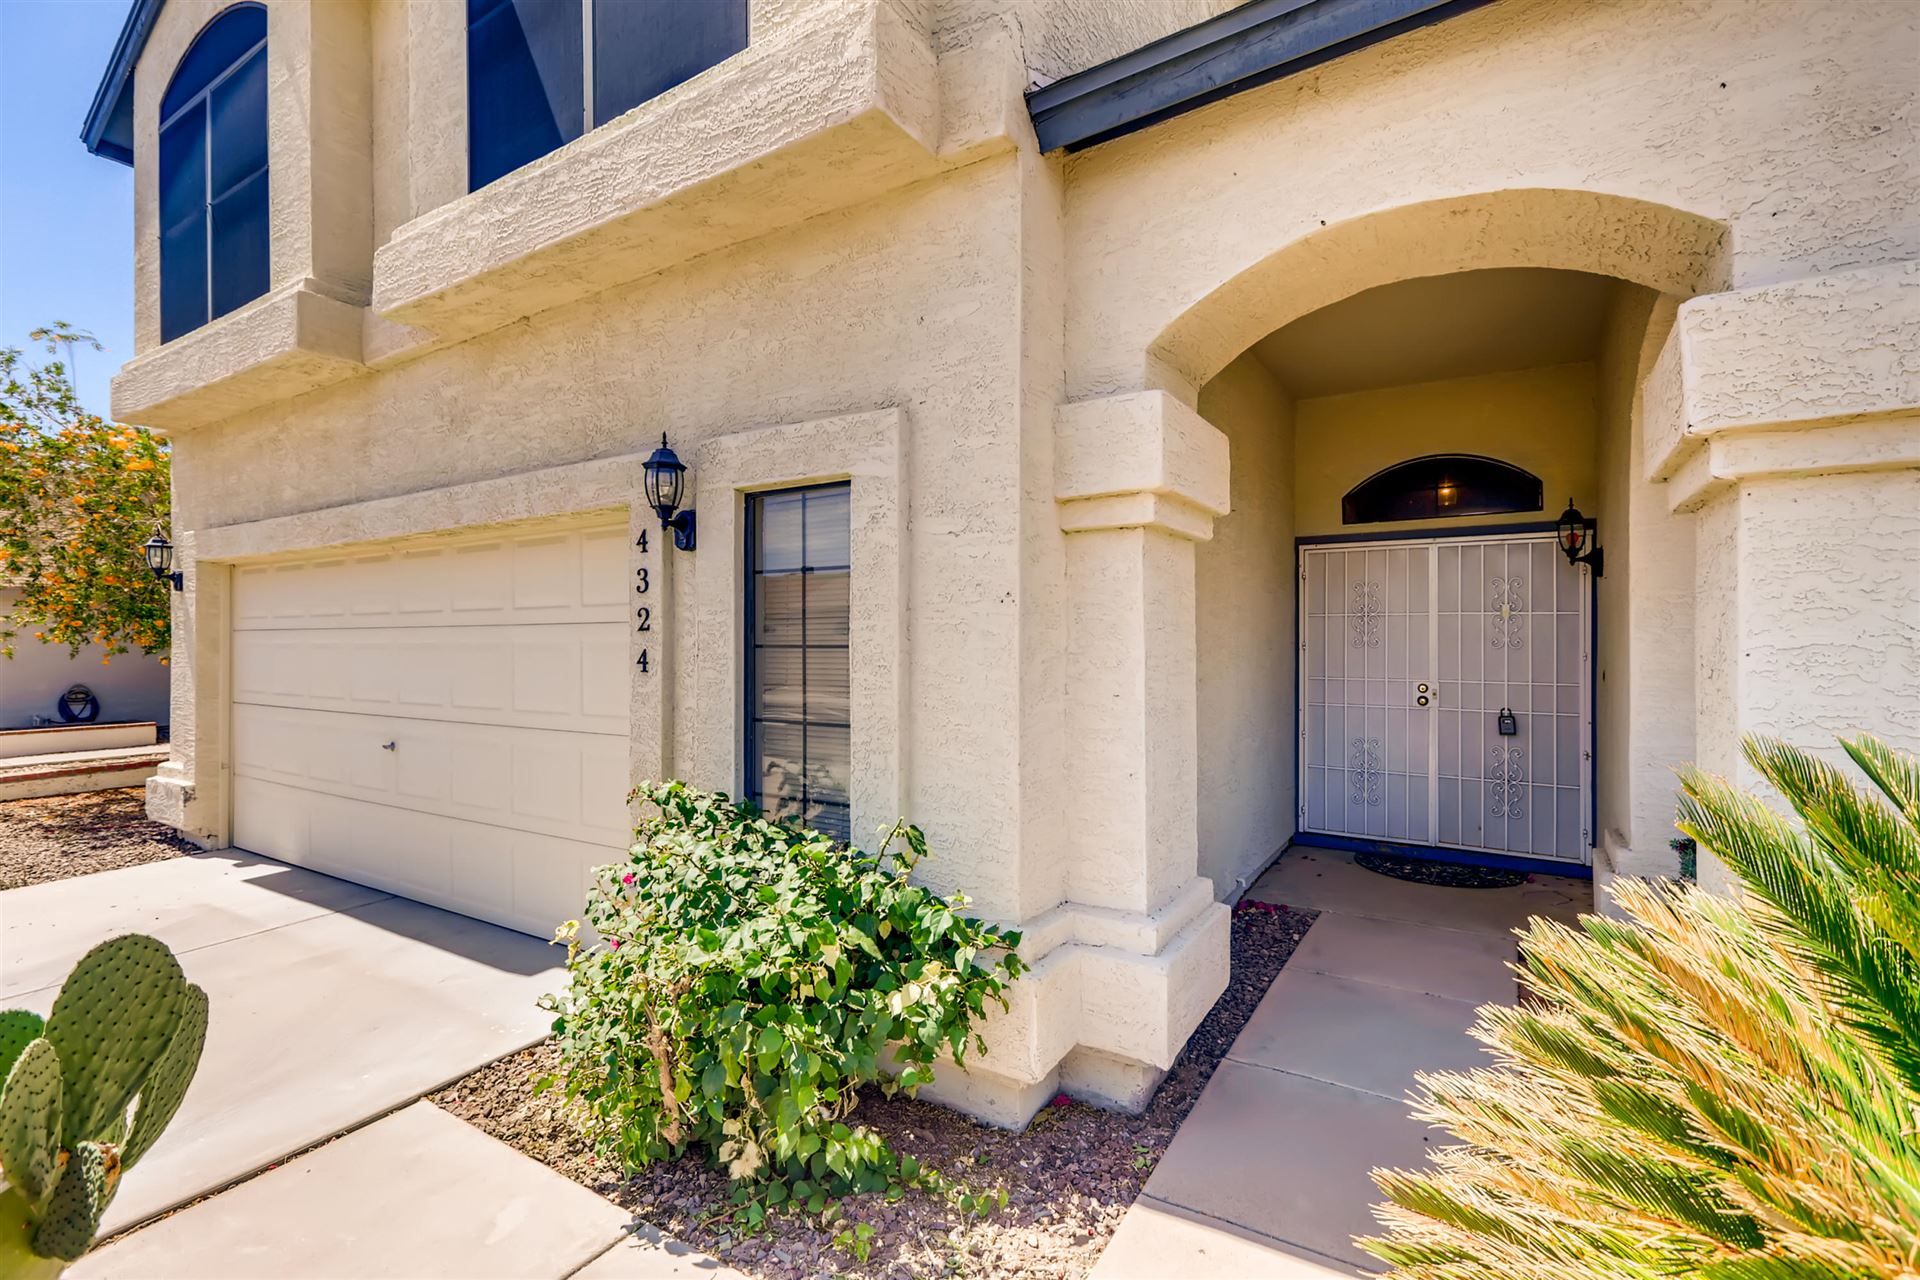 Photo of 4324 W BEHREND Drive, Glendale, AZ 85308 (MLS # 6234103)